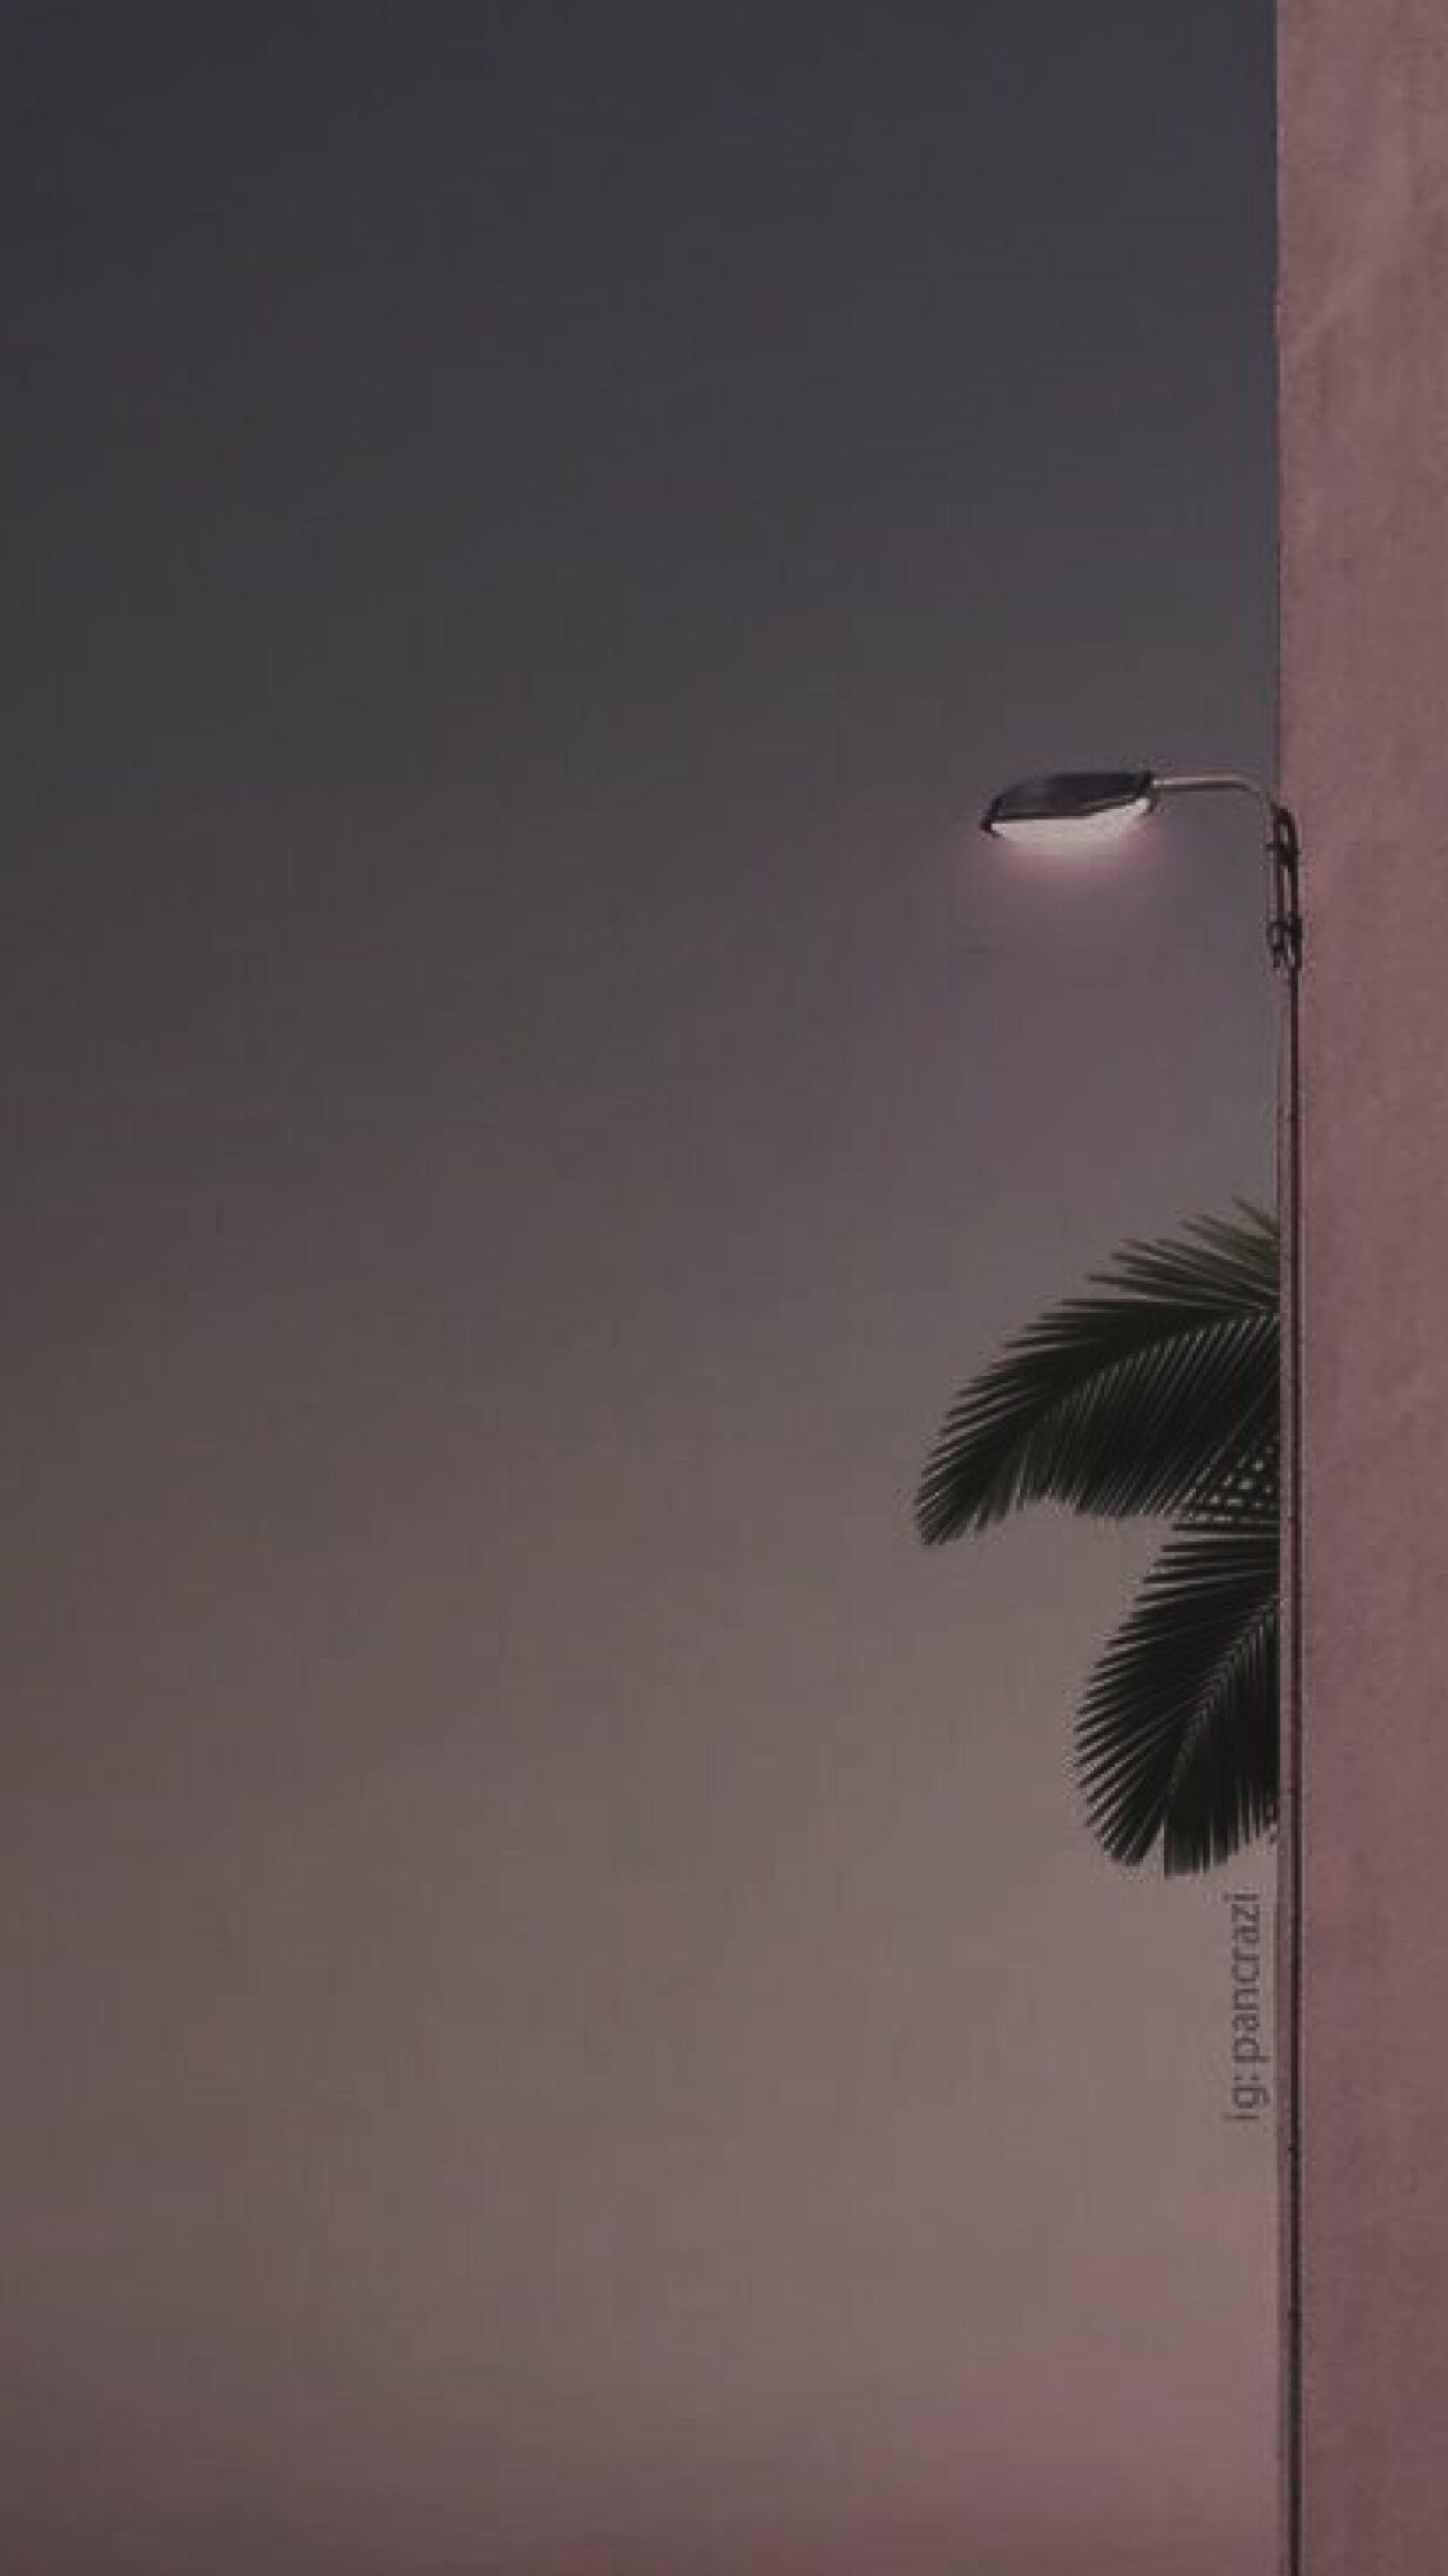 Iphone Aesthetic Wallpaper Hd - HD Wallpaper